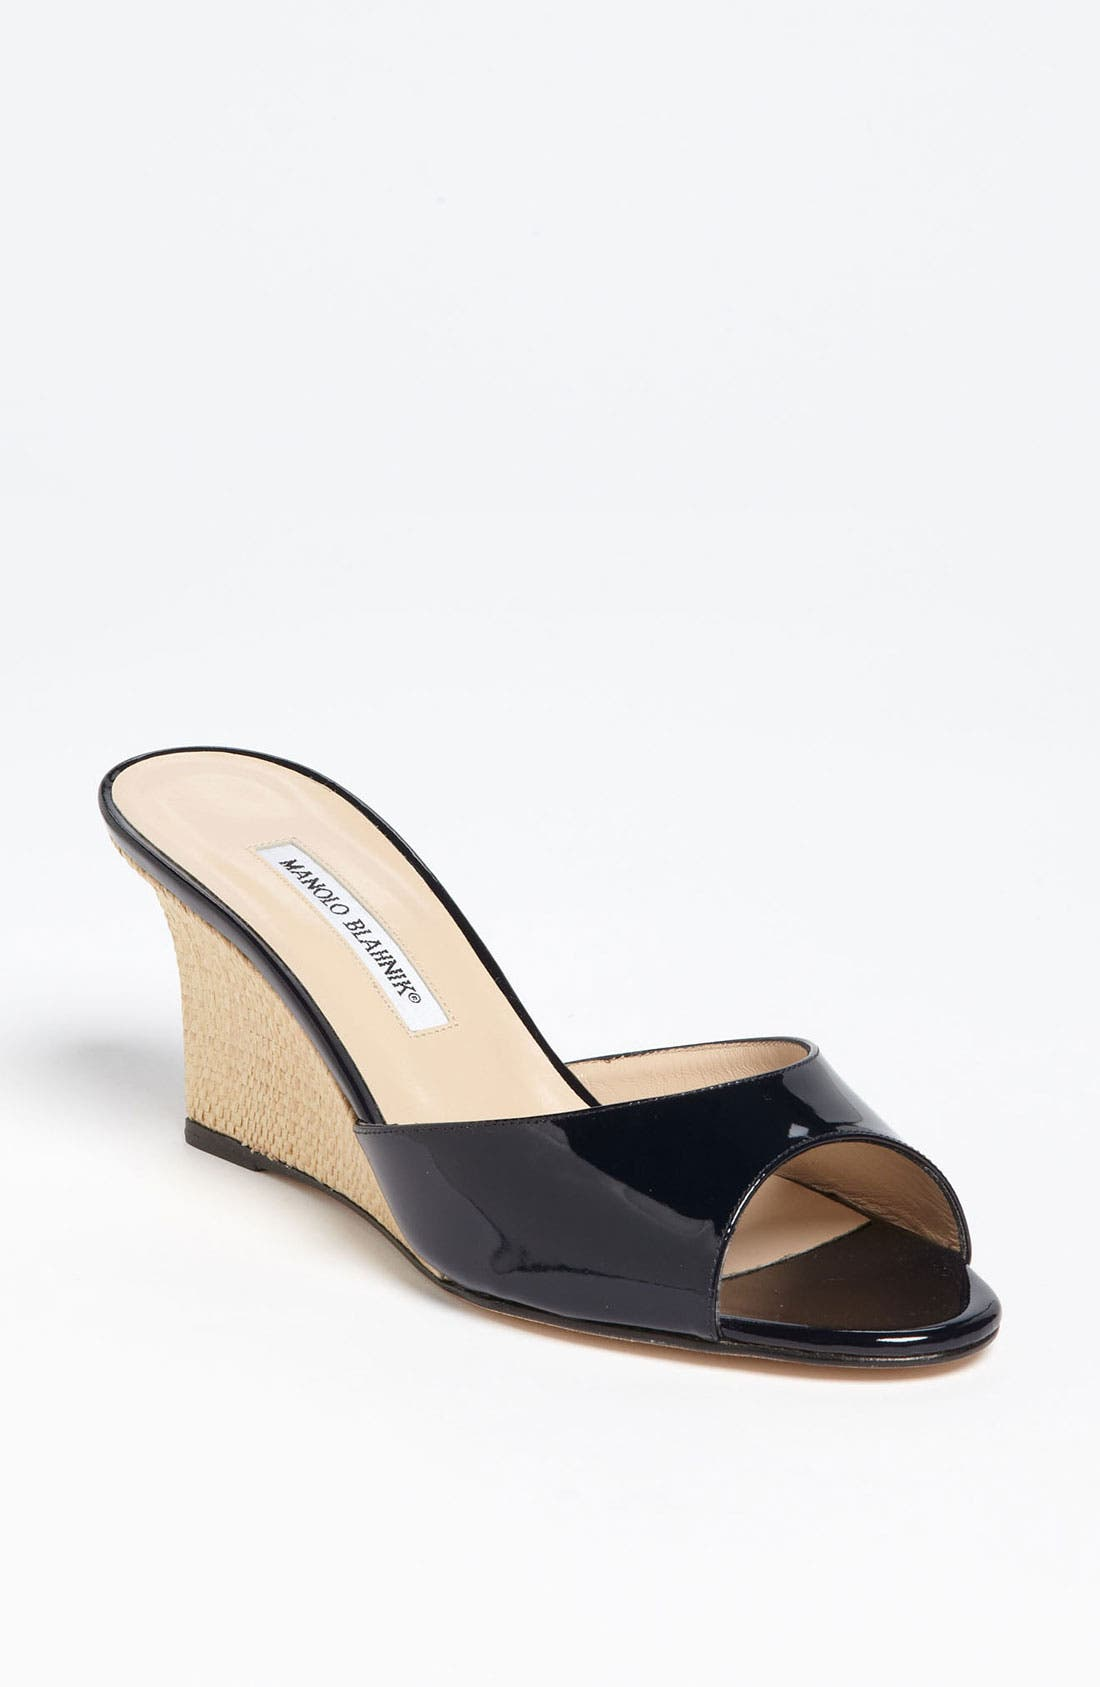 Alternate Image 1 Selected - Manolo Blahnik 'Falsonol' Sandal